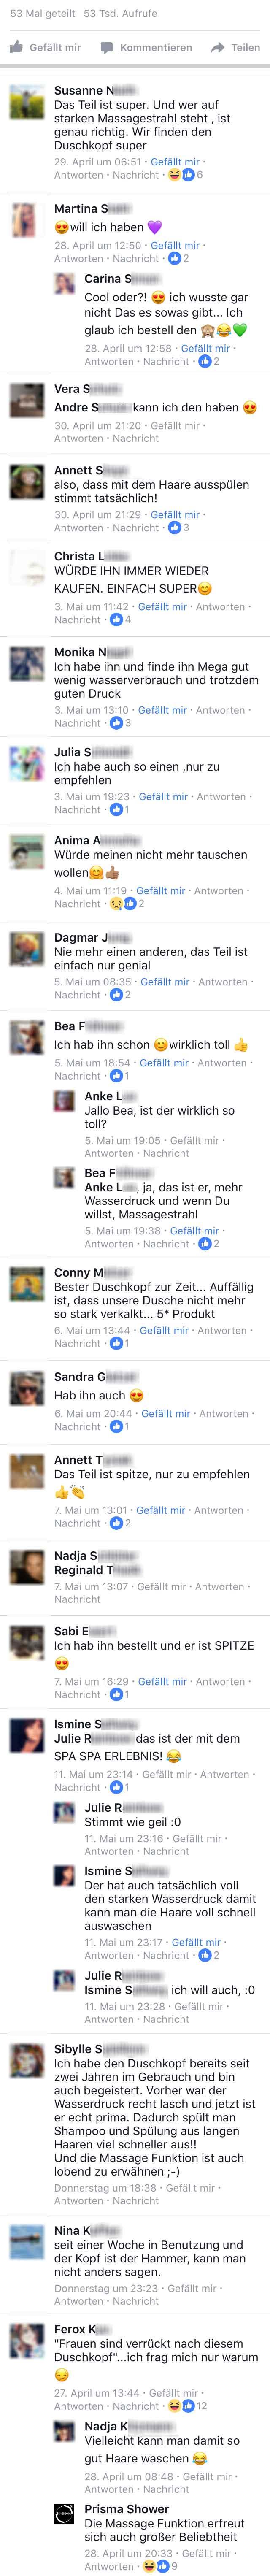 Echte Facebook Kommentare